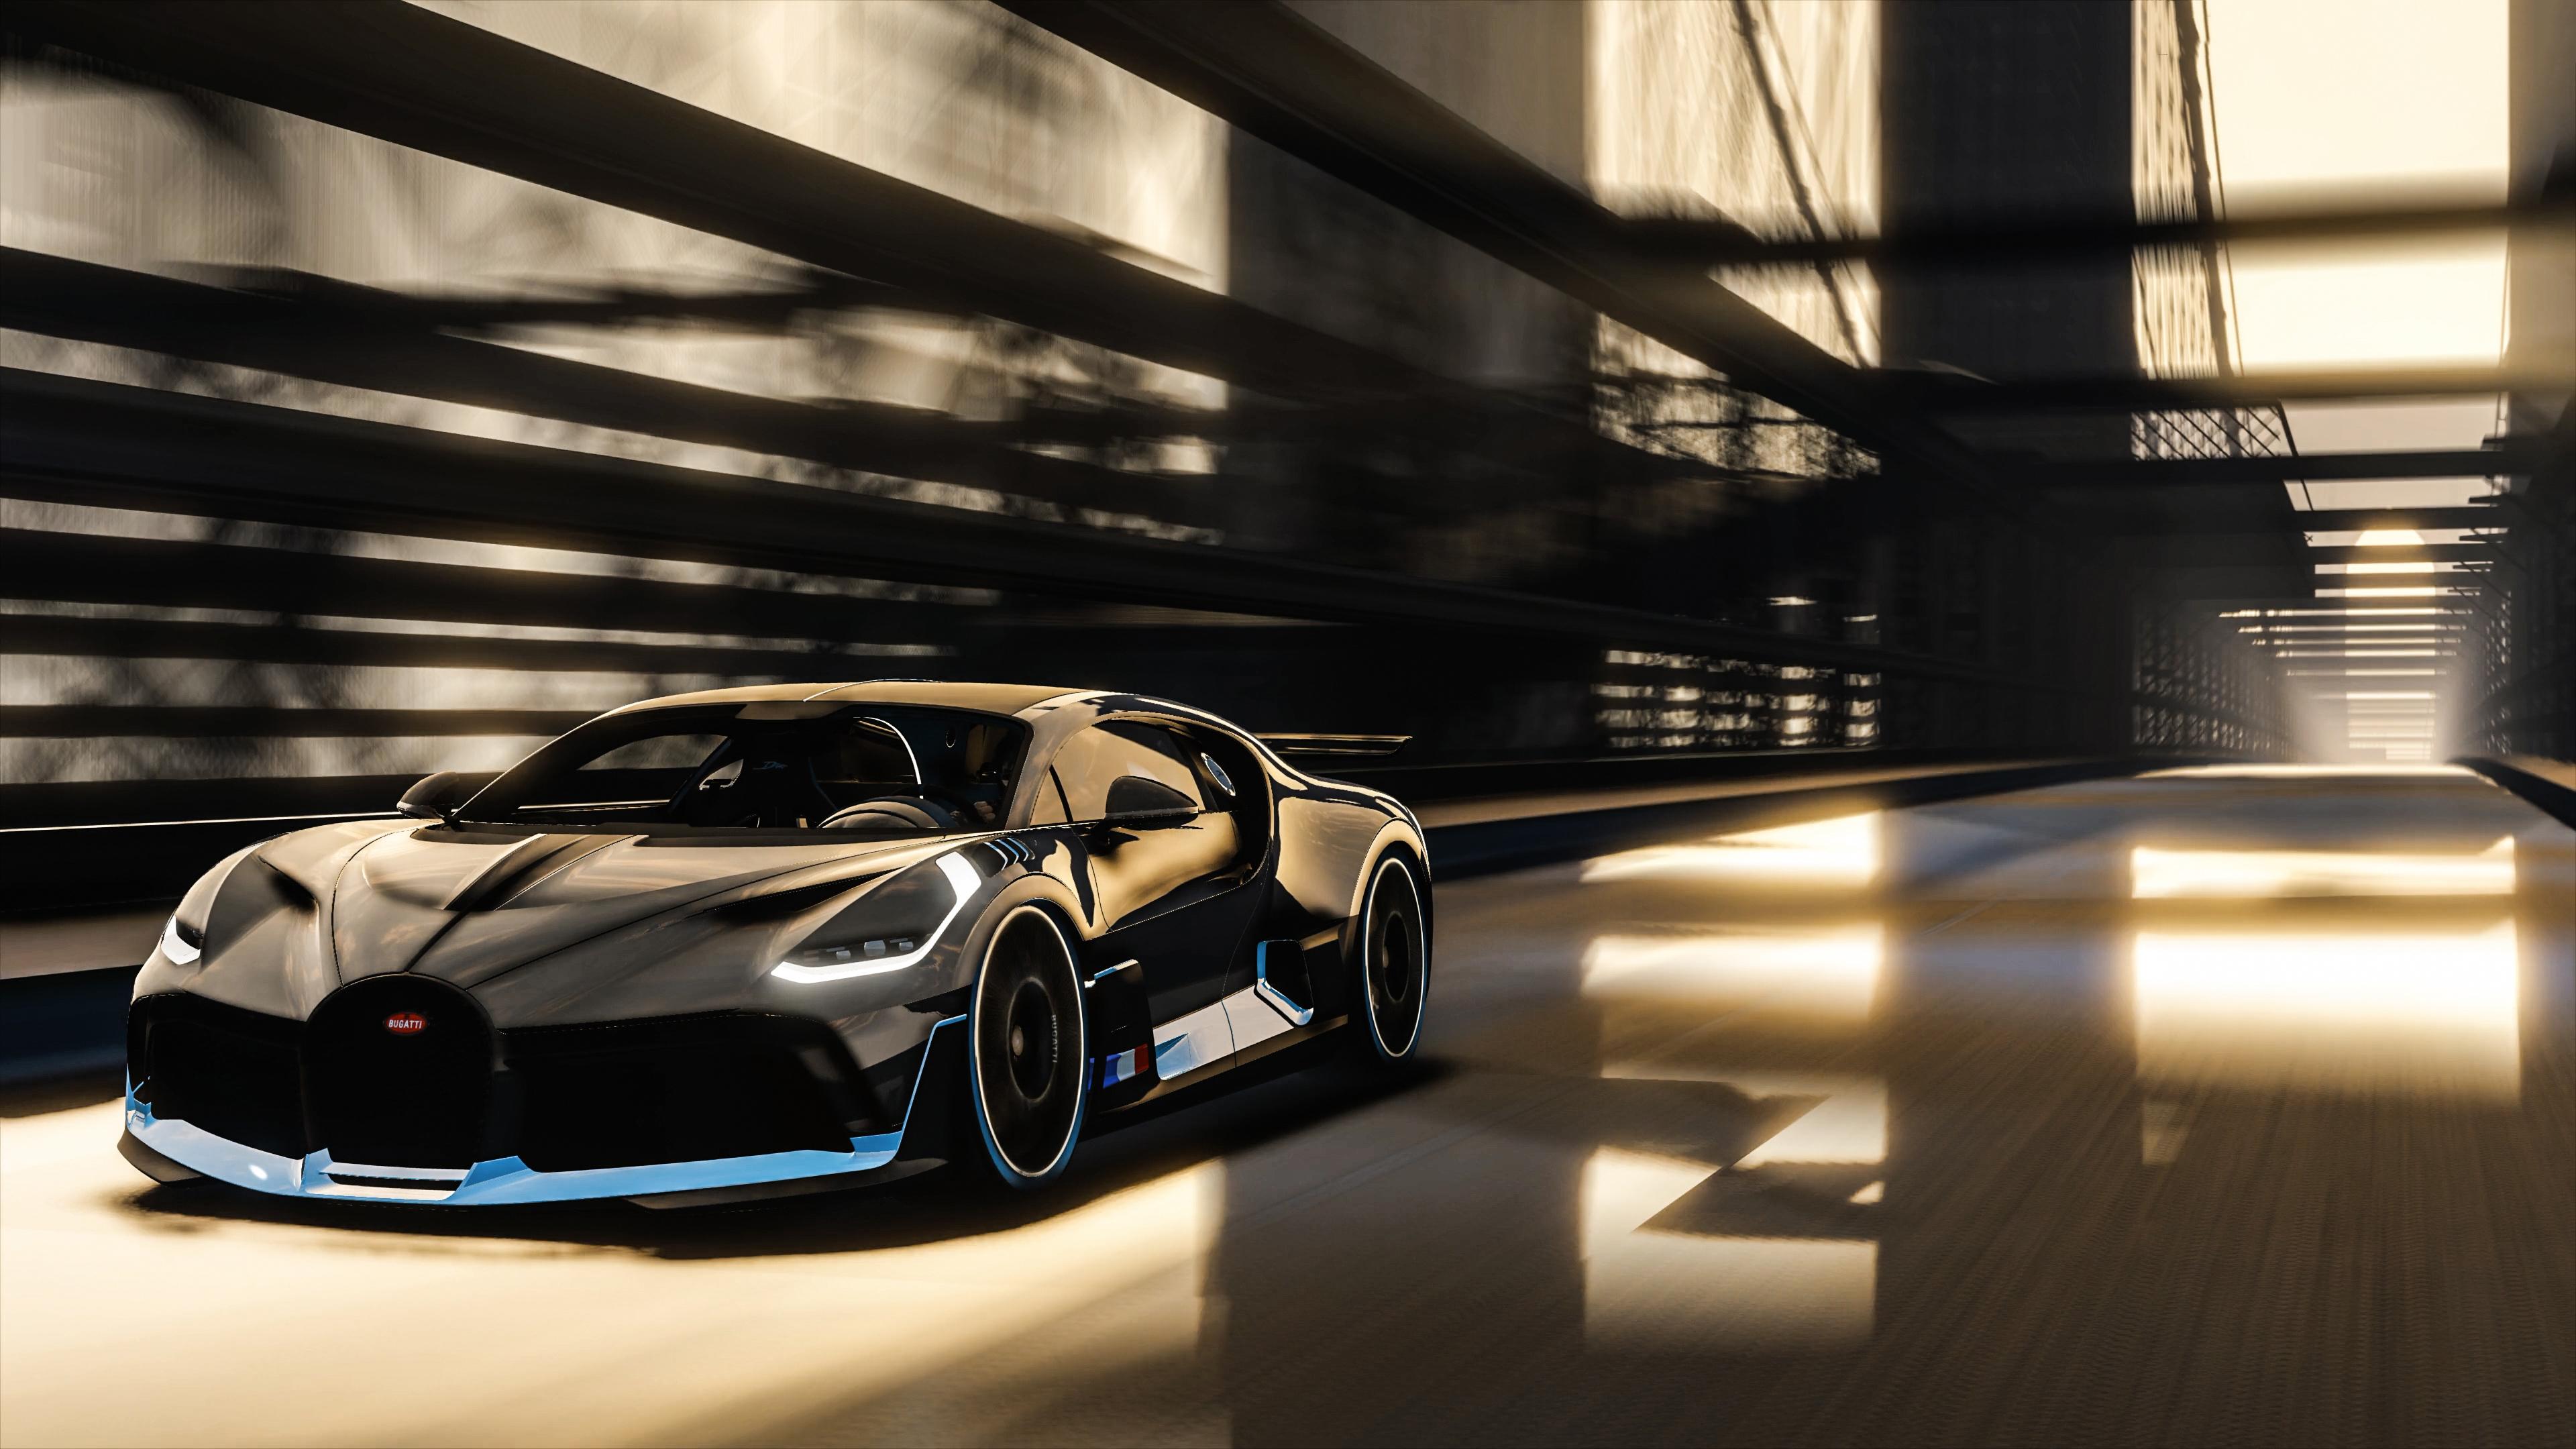 2048x1152 Gta V Redux Nature 2048x1152 Resolution Hd 4k: Gta V Bugatti Divo, HD Games, 4k Wallpapers, Images